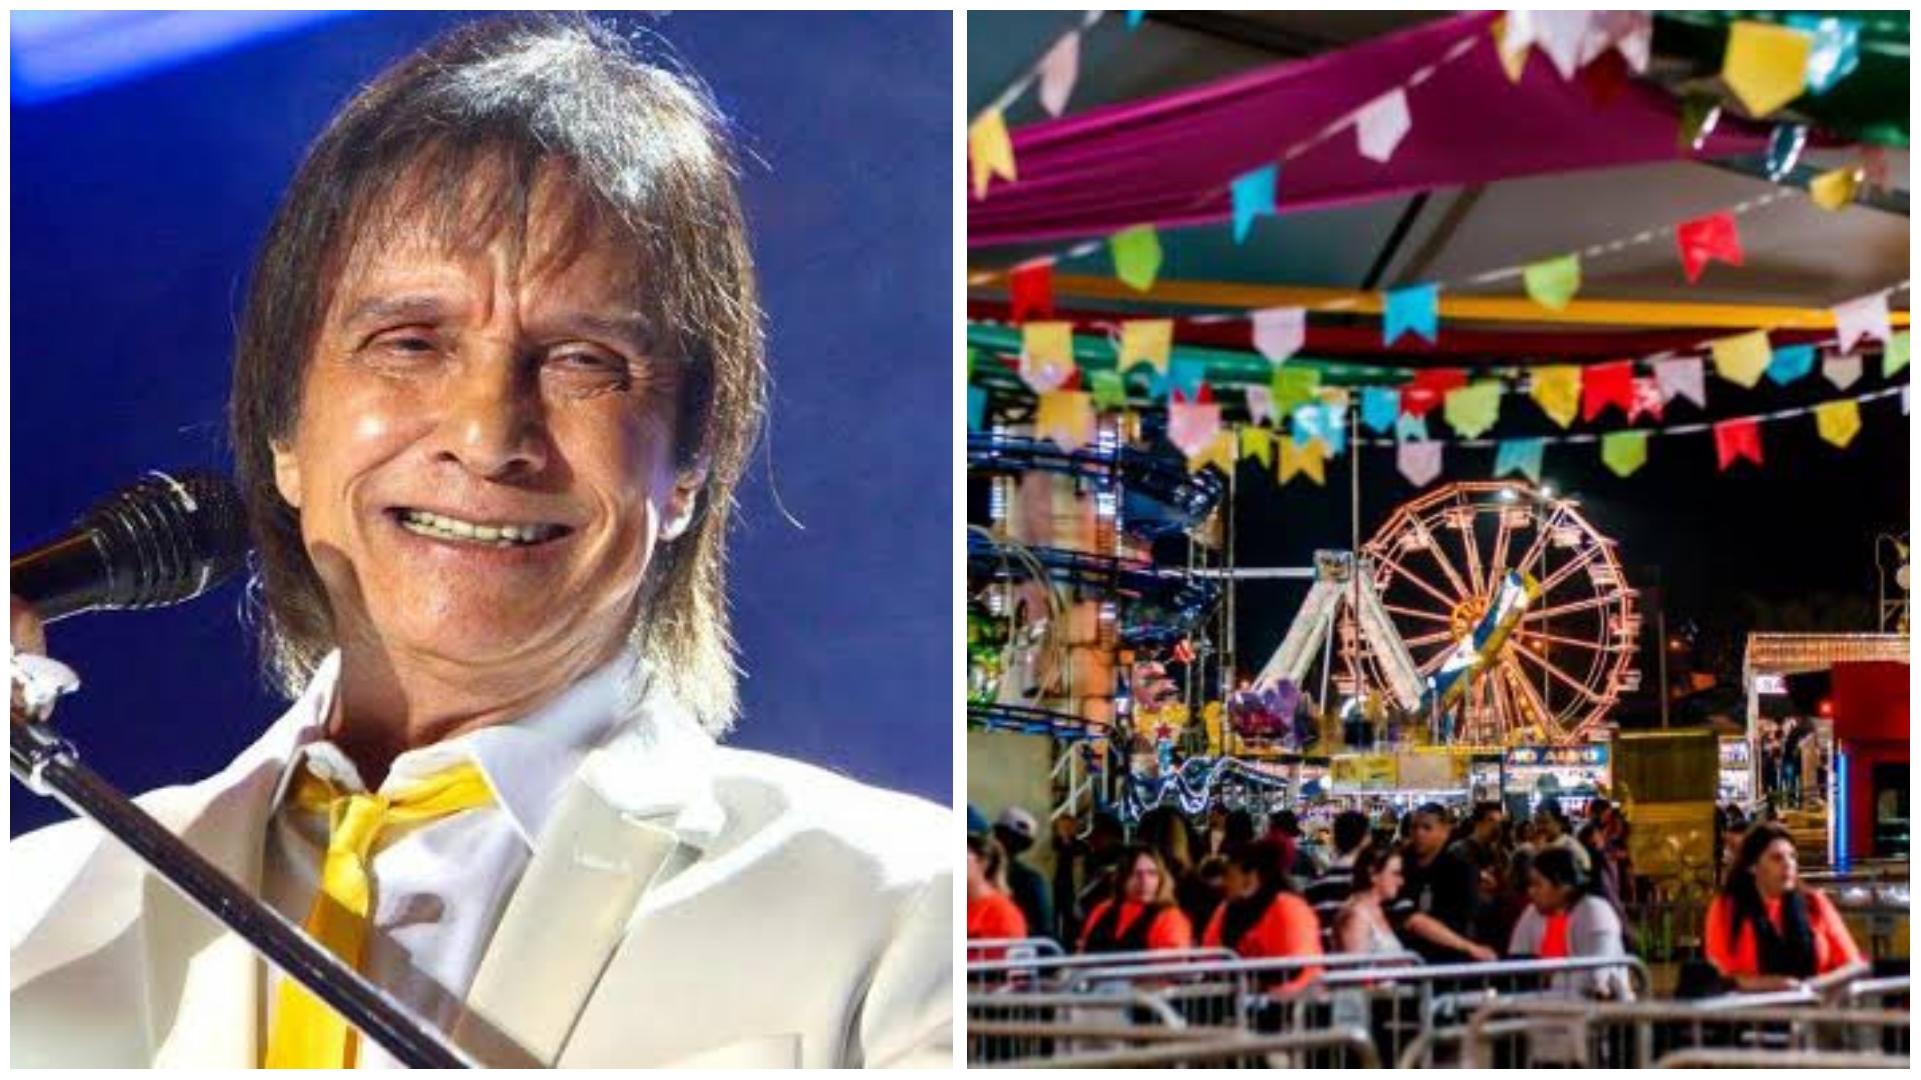 Roberto Carlos se apresentará pela 1ª vez na Festa Junina de Votorantim